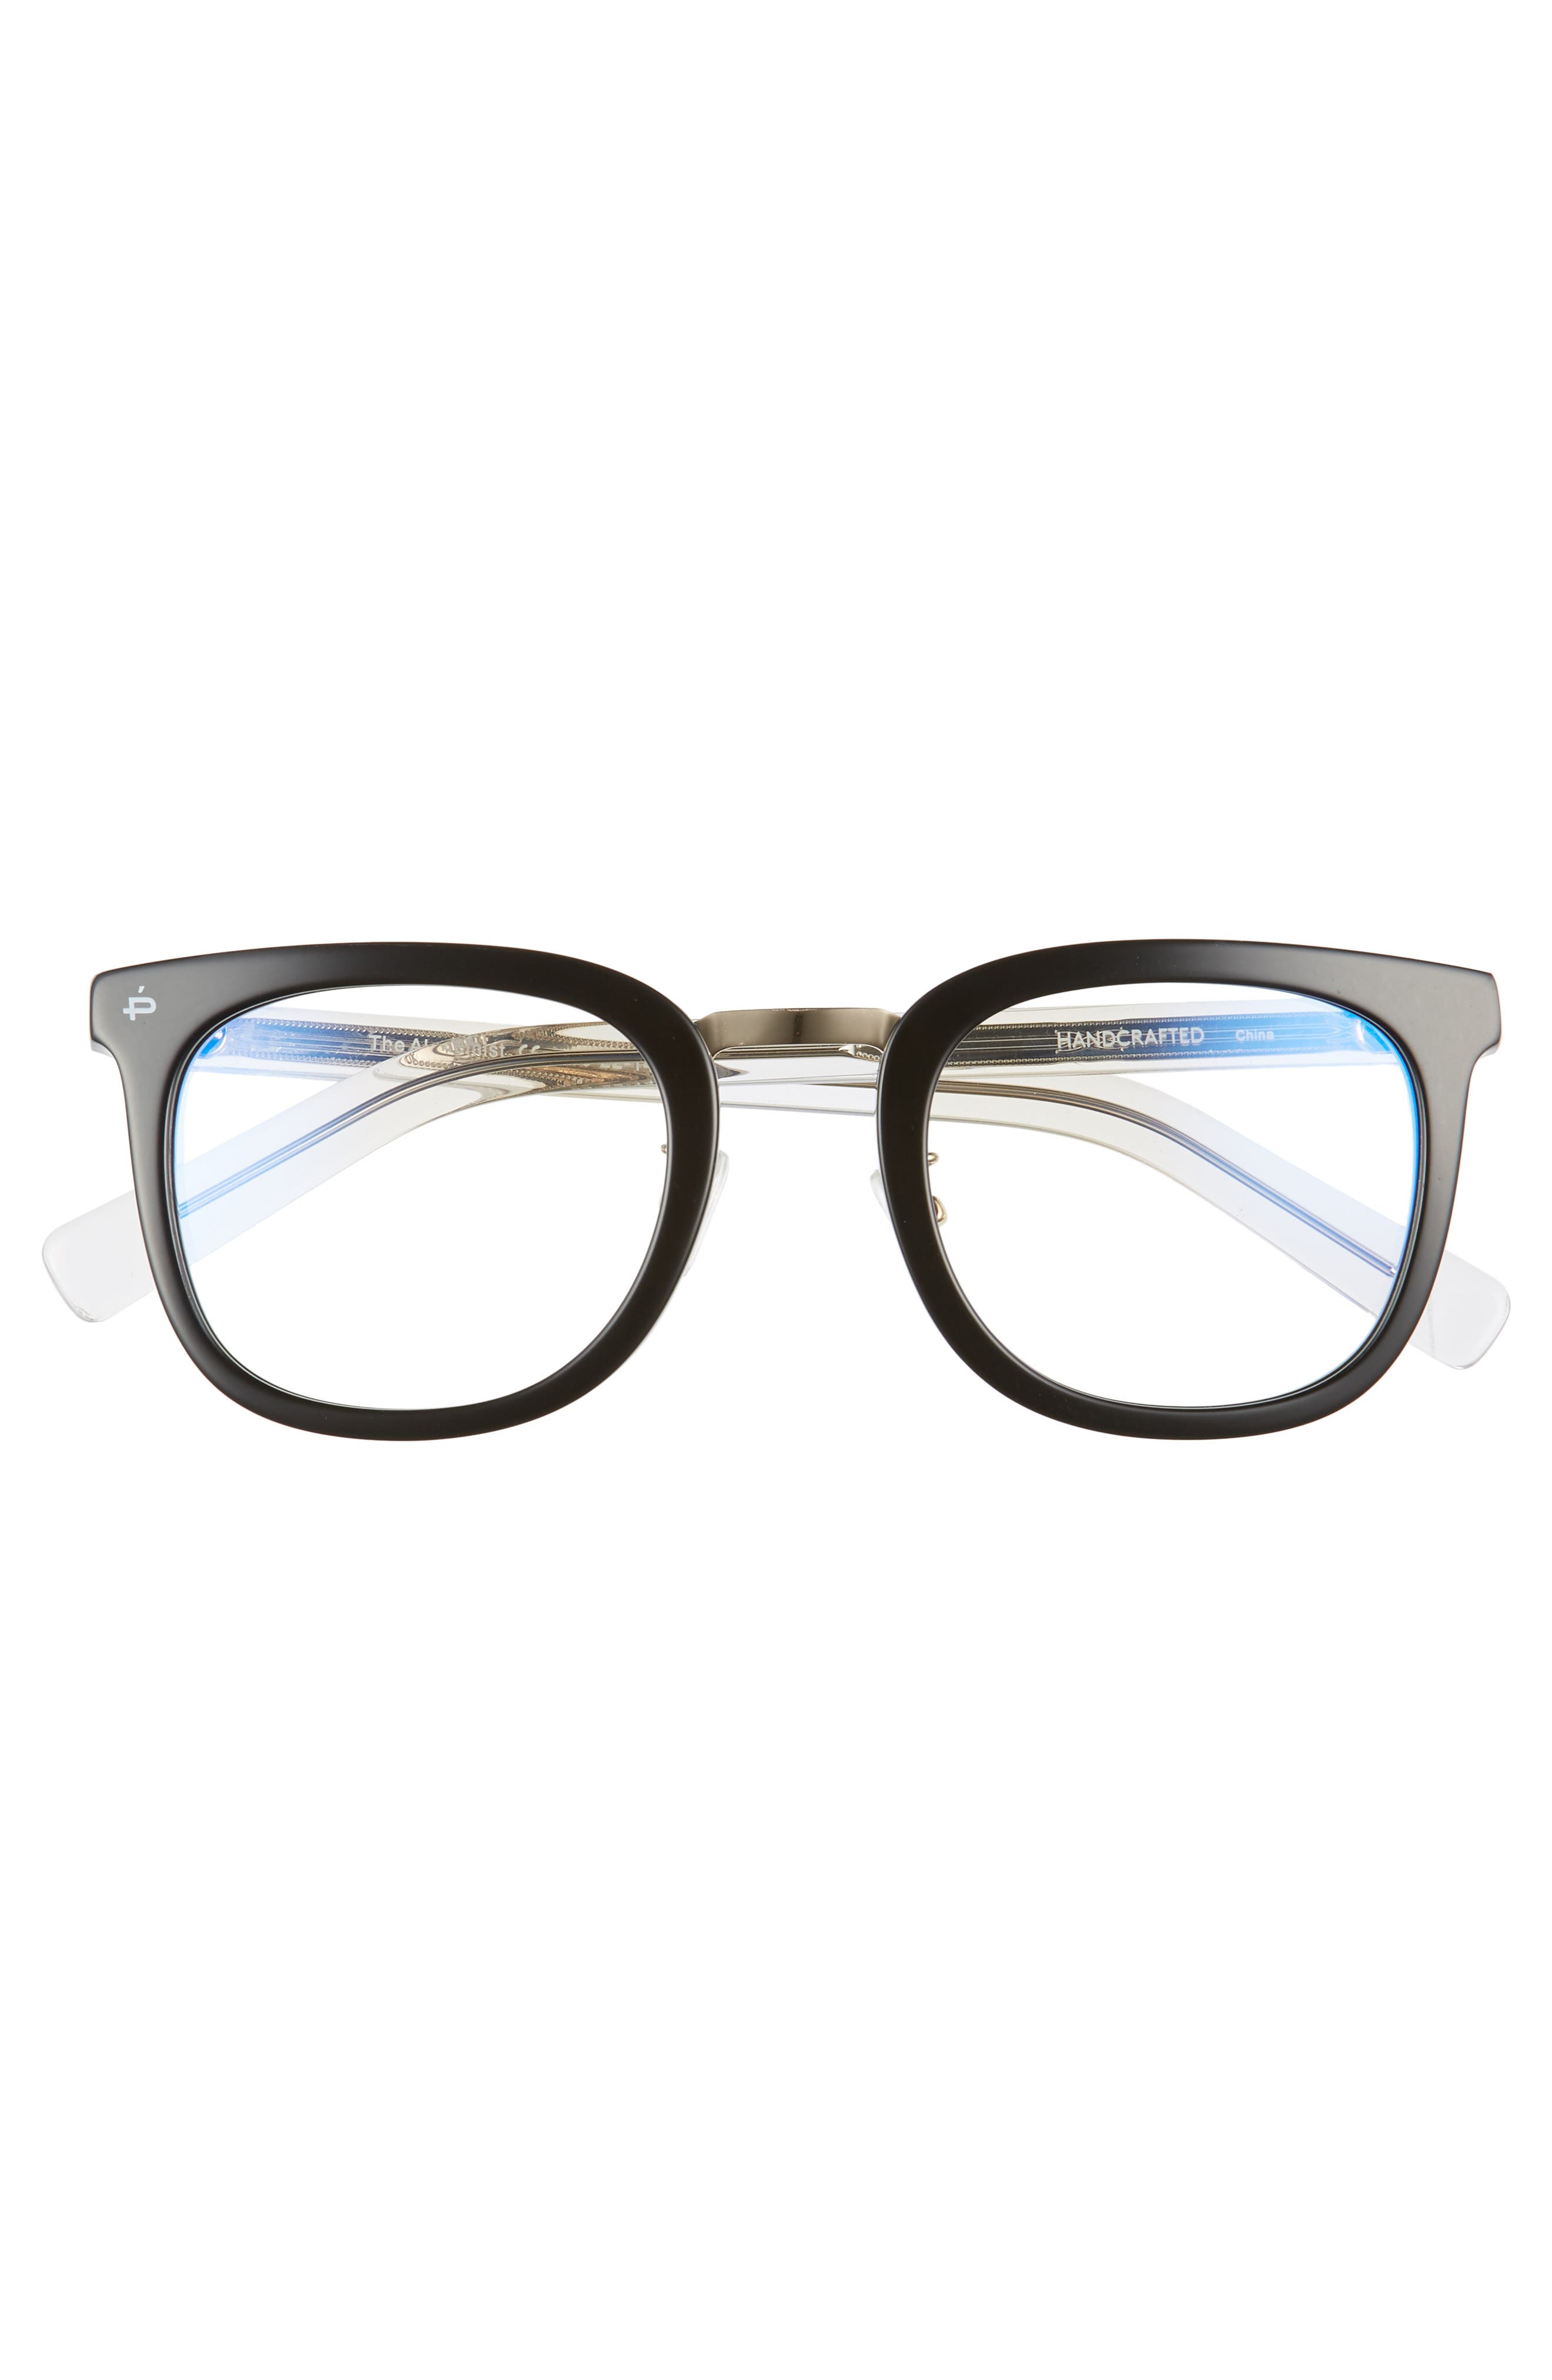 Privé Revaux The Alchemist 53mm Blue Light Blocking Glasses,                             Alternate thumbnail 3, color,                             Black